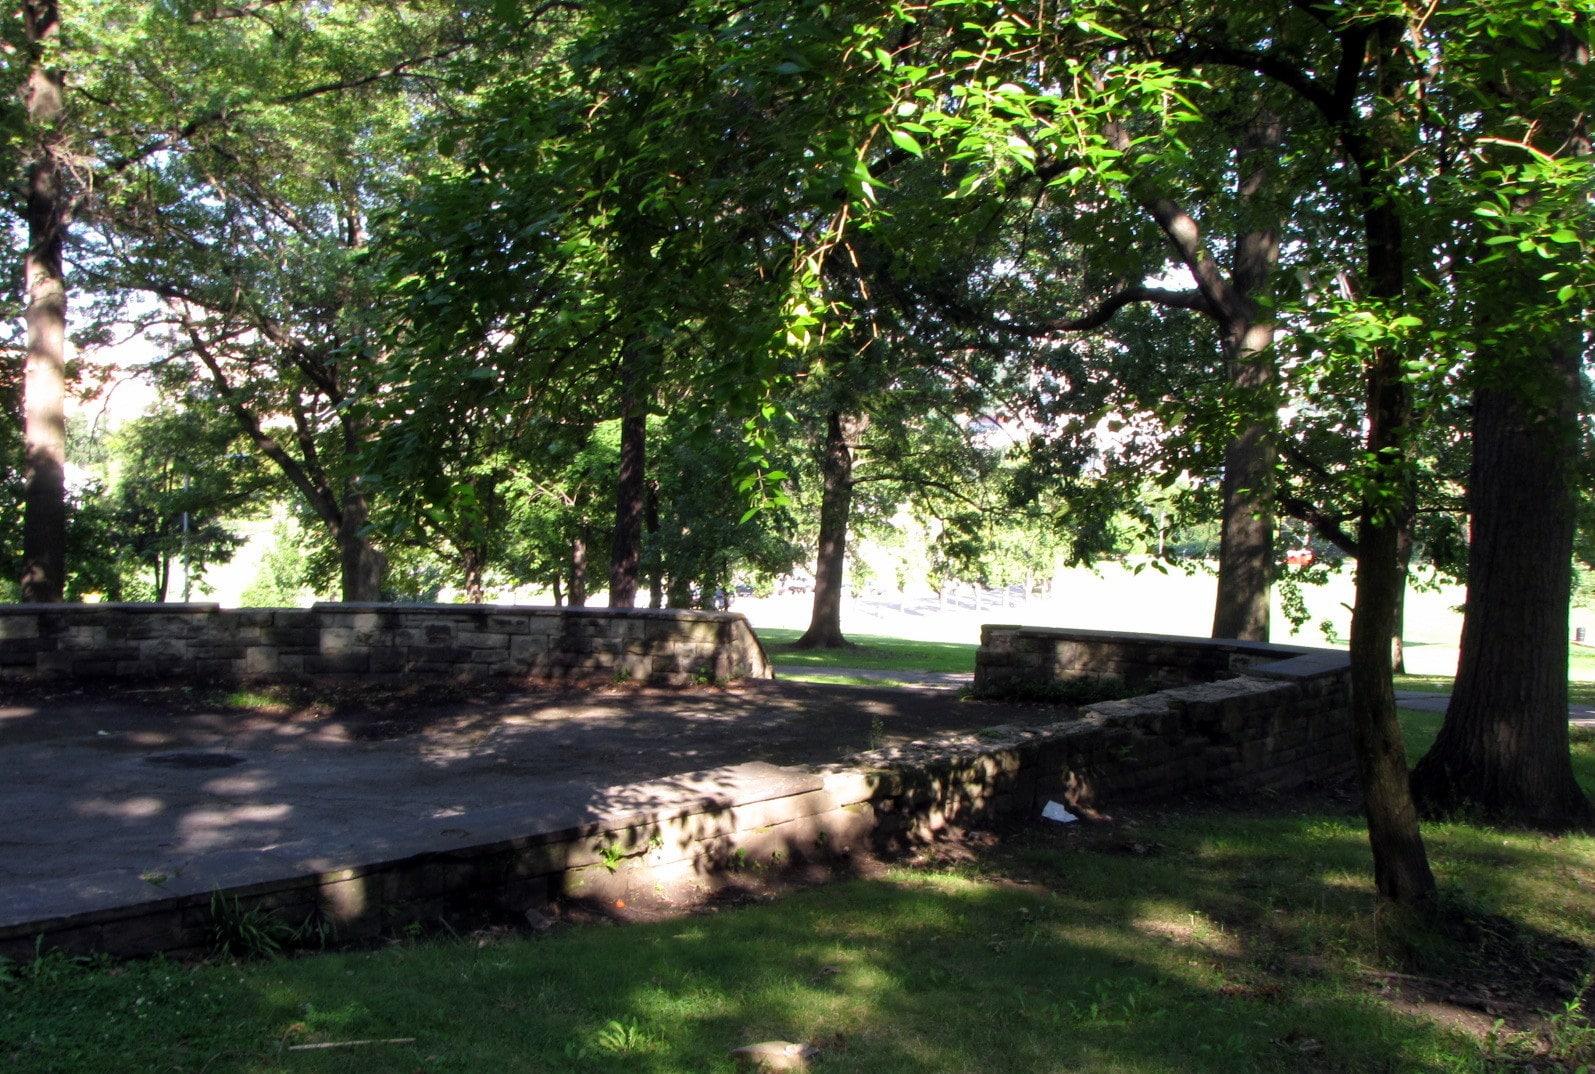 Flagstaff Hill Woodland Garden